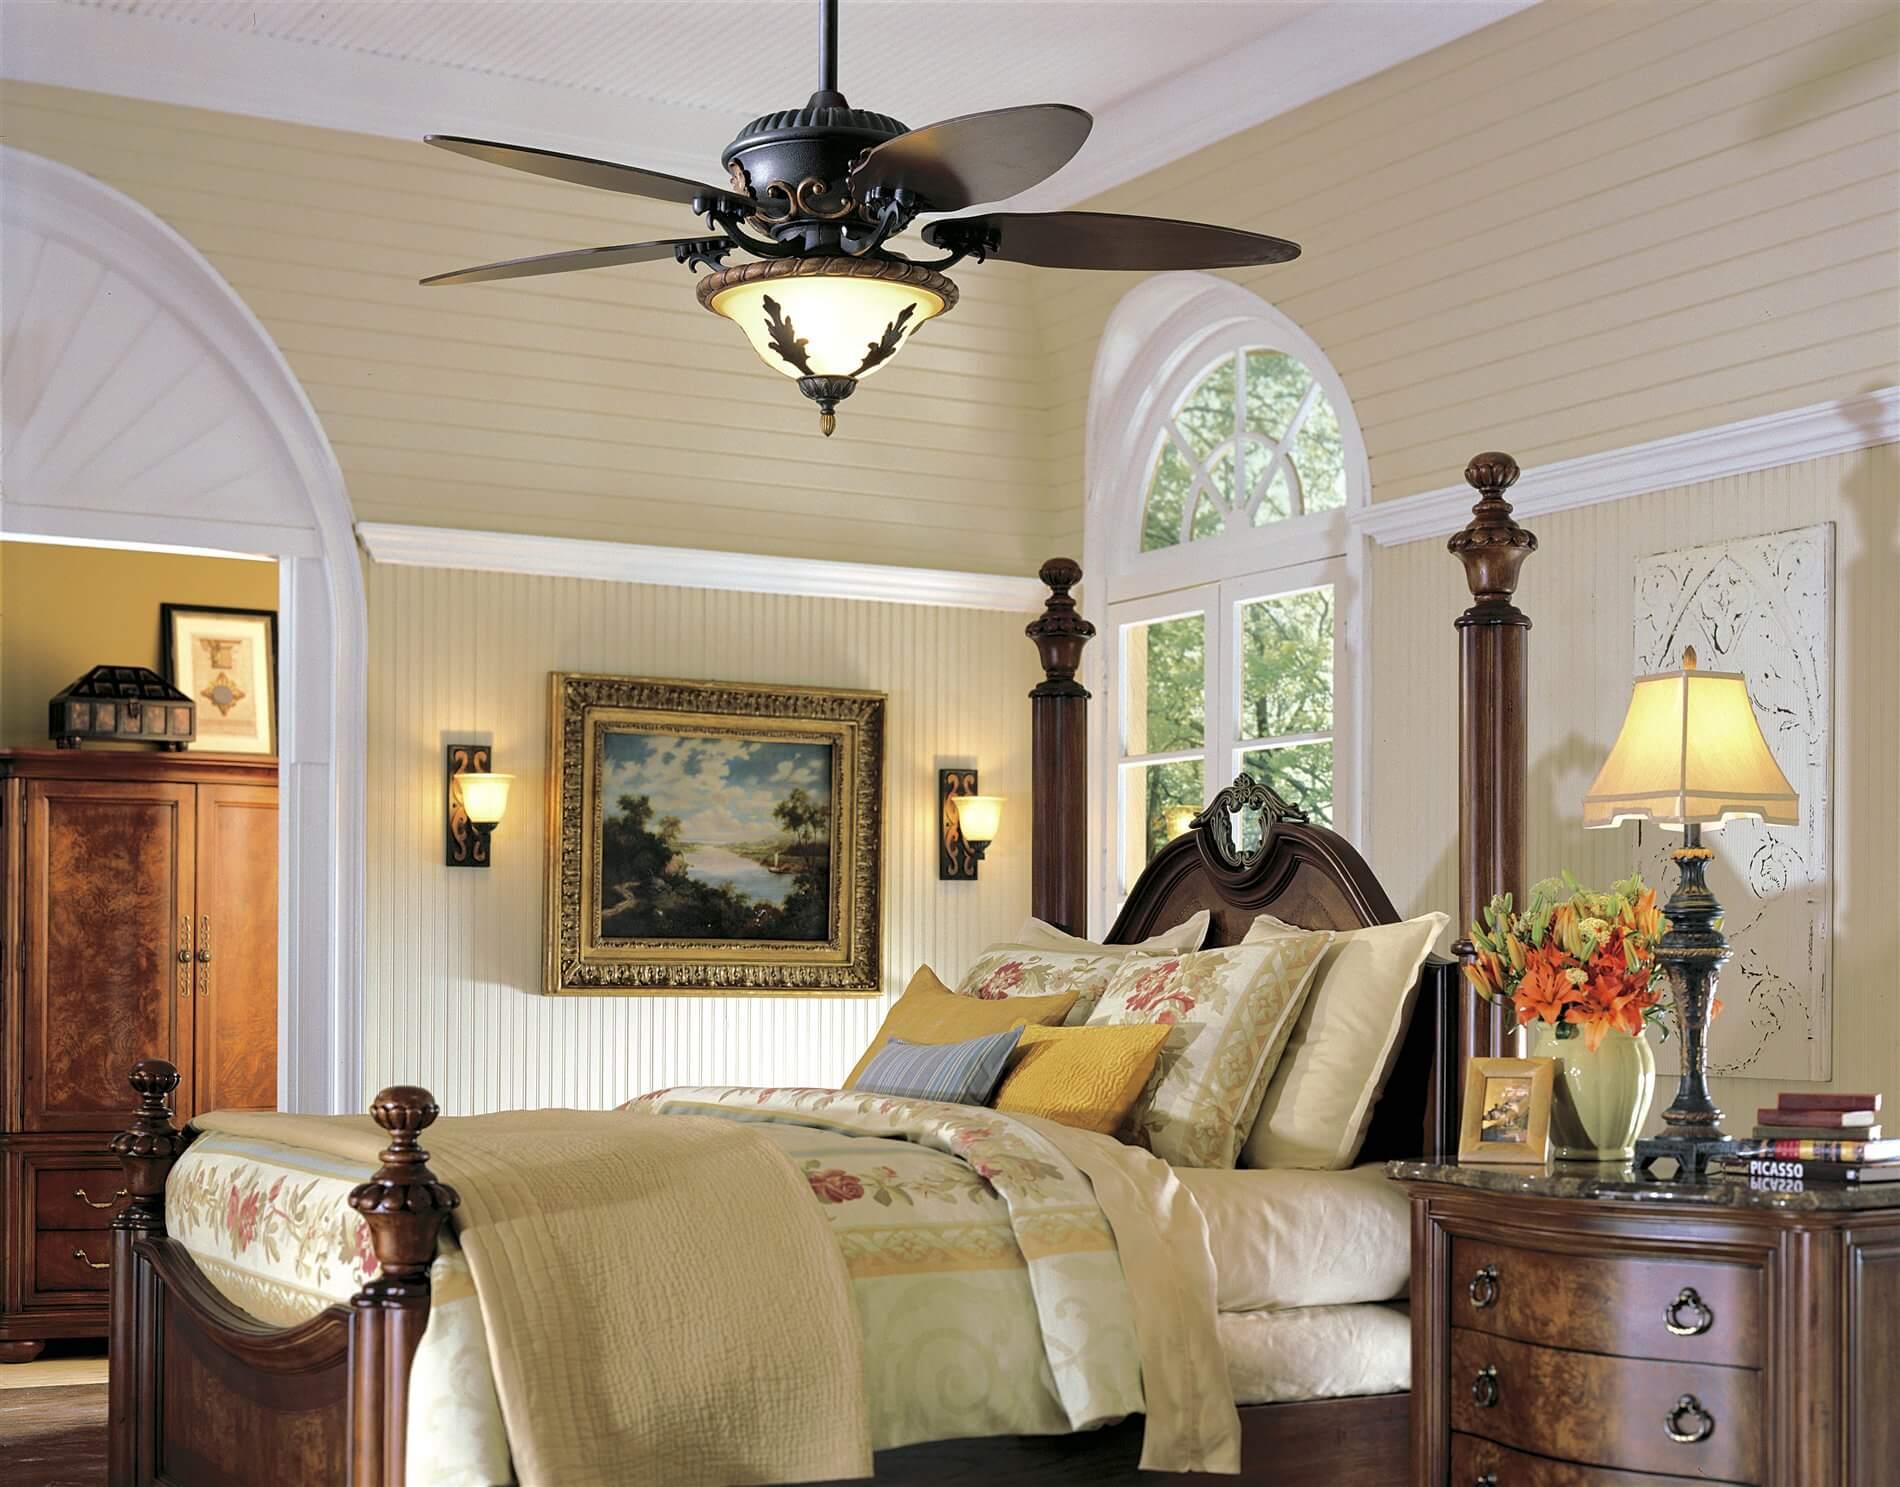 Bedrooms Ceiling Fans